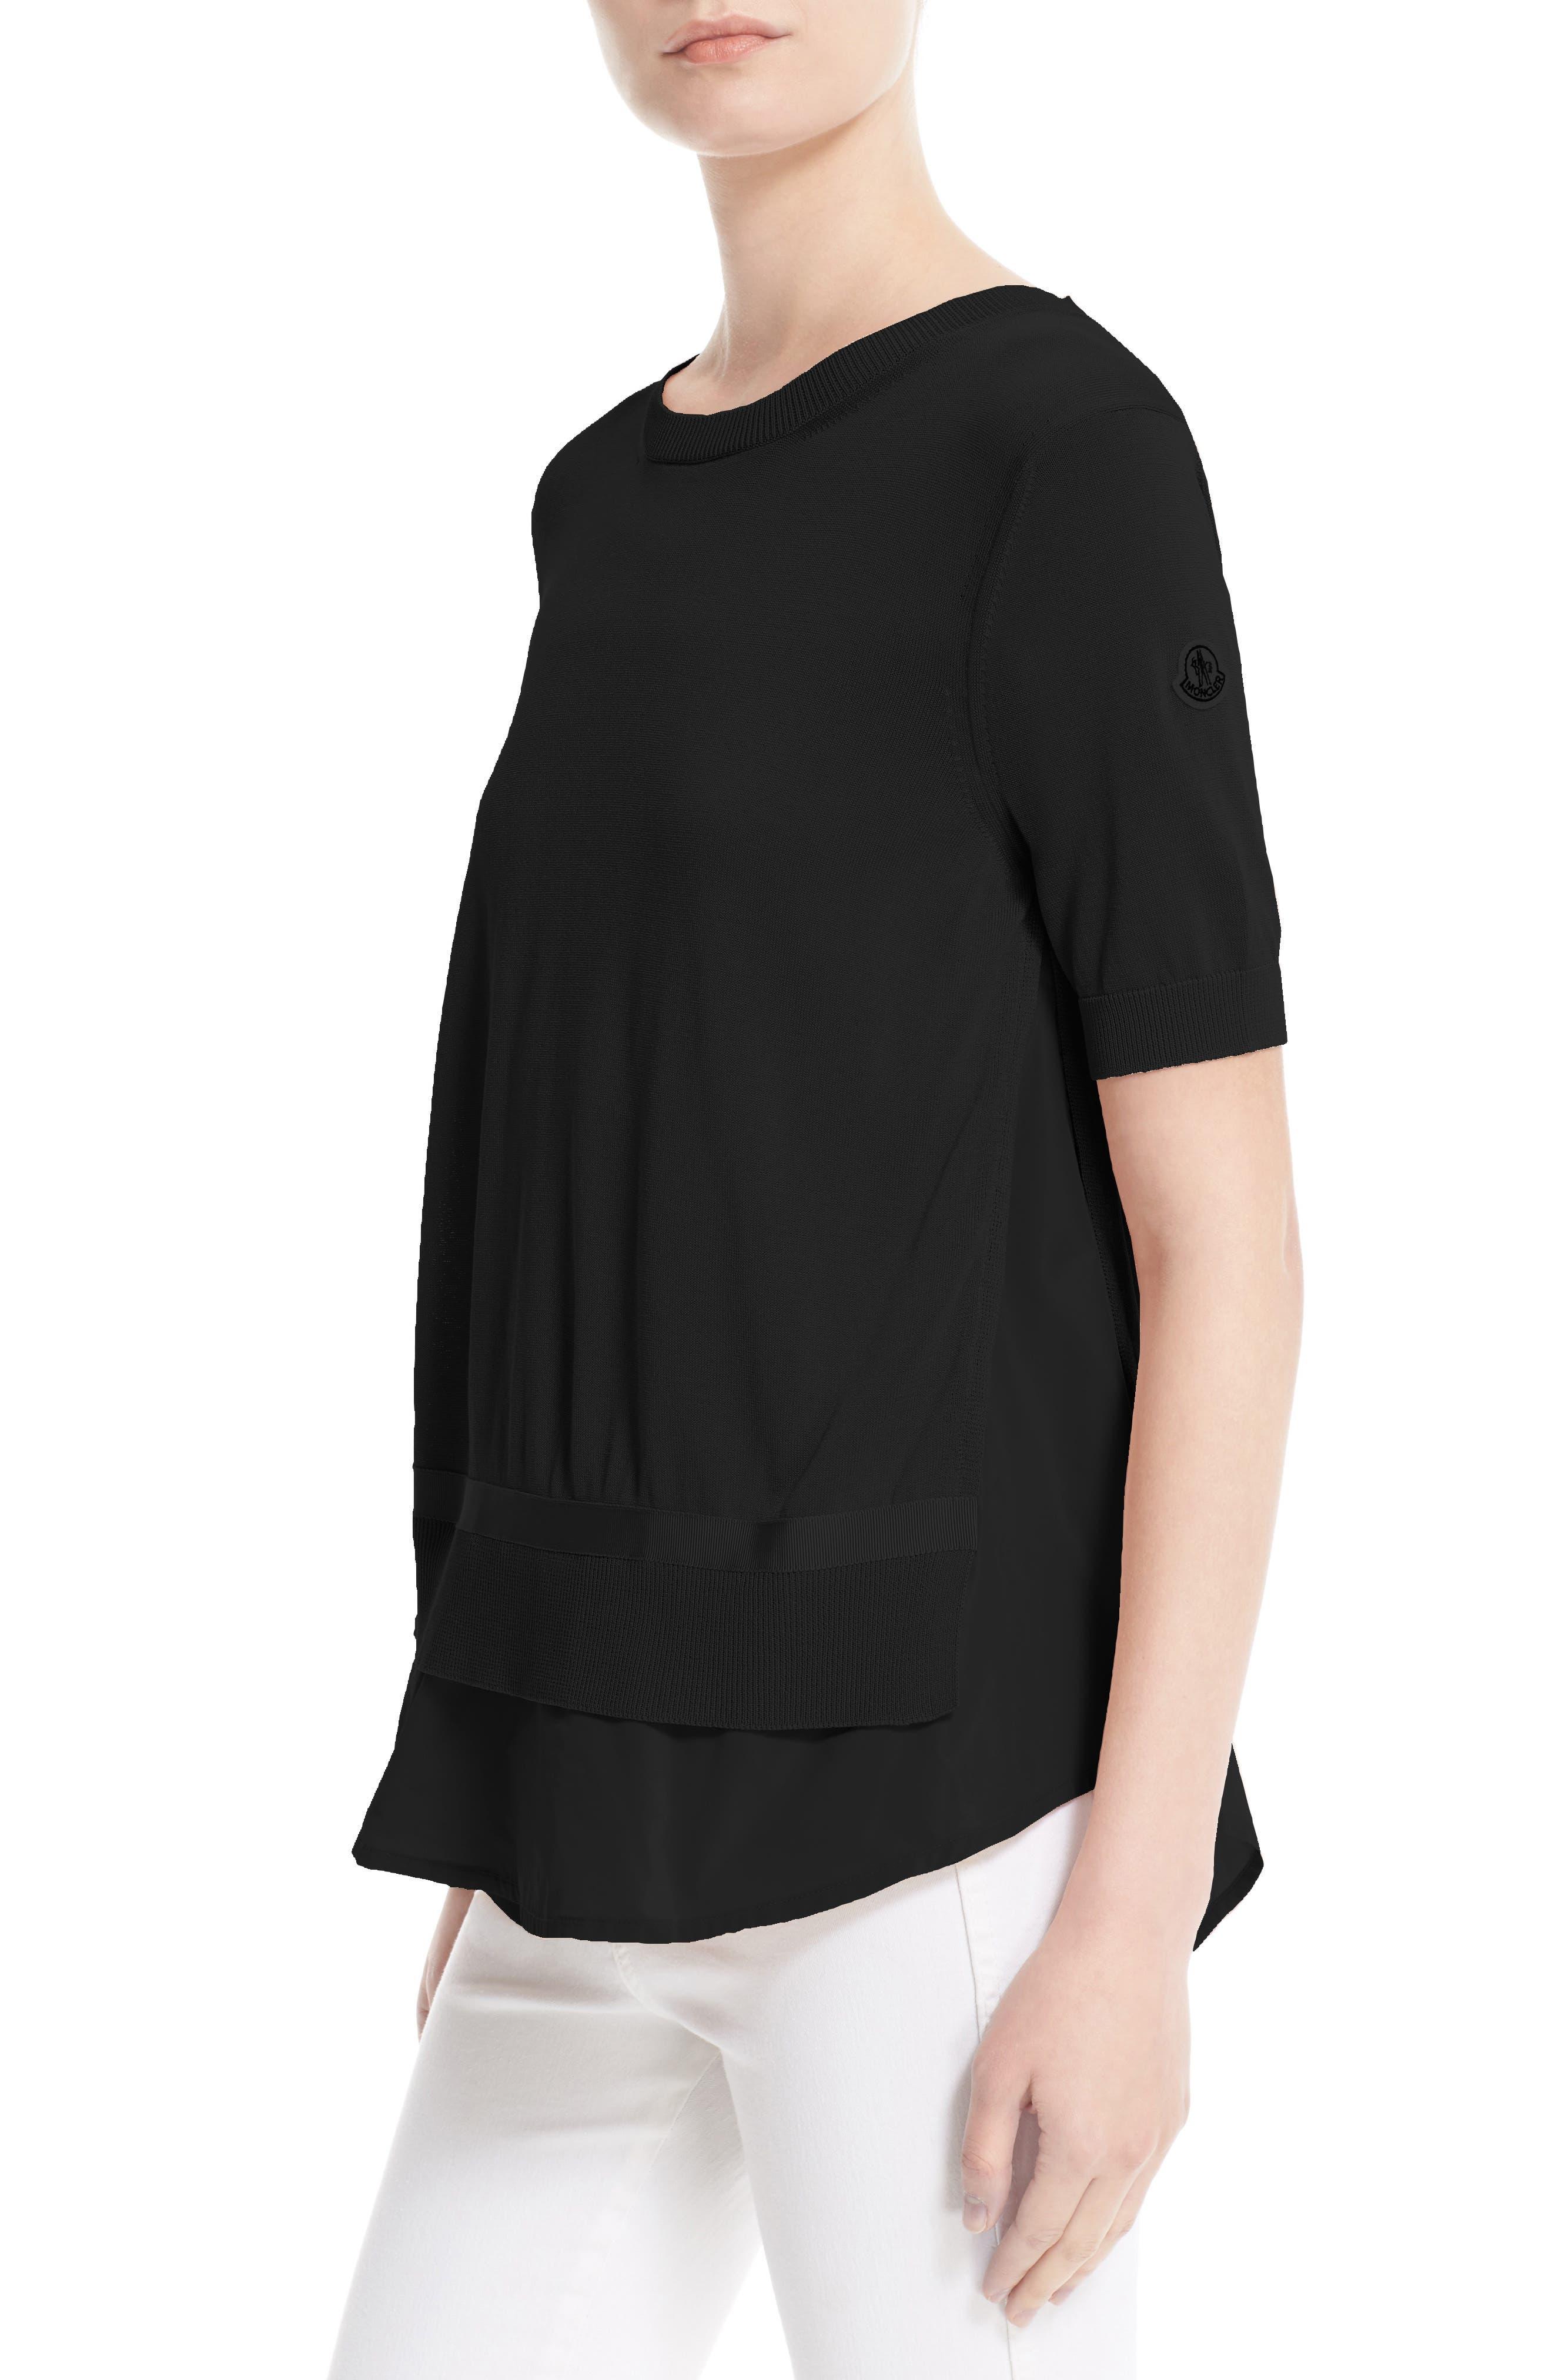 Tricot Knit Top,                             Alternate thumbnail 4, color,                             BLACK